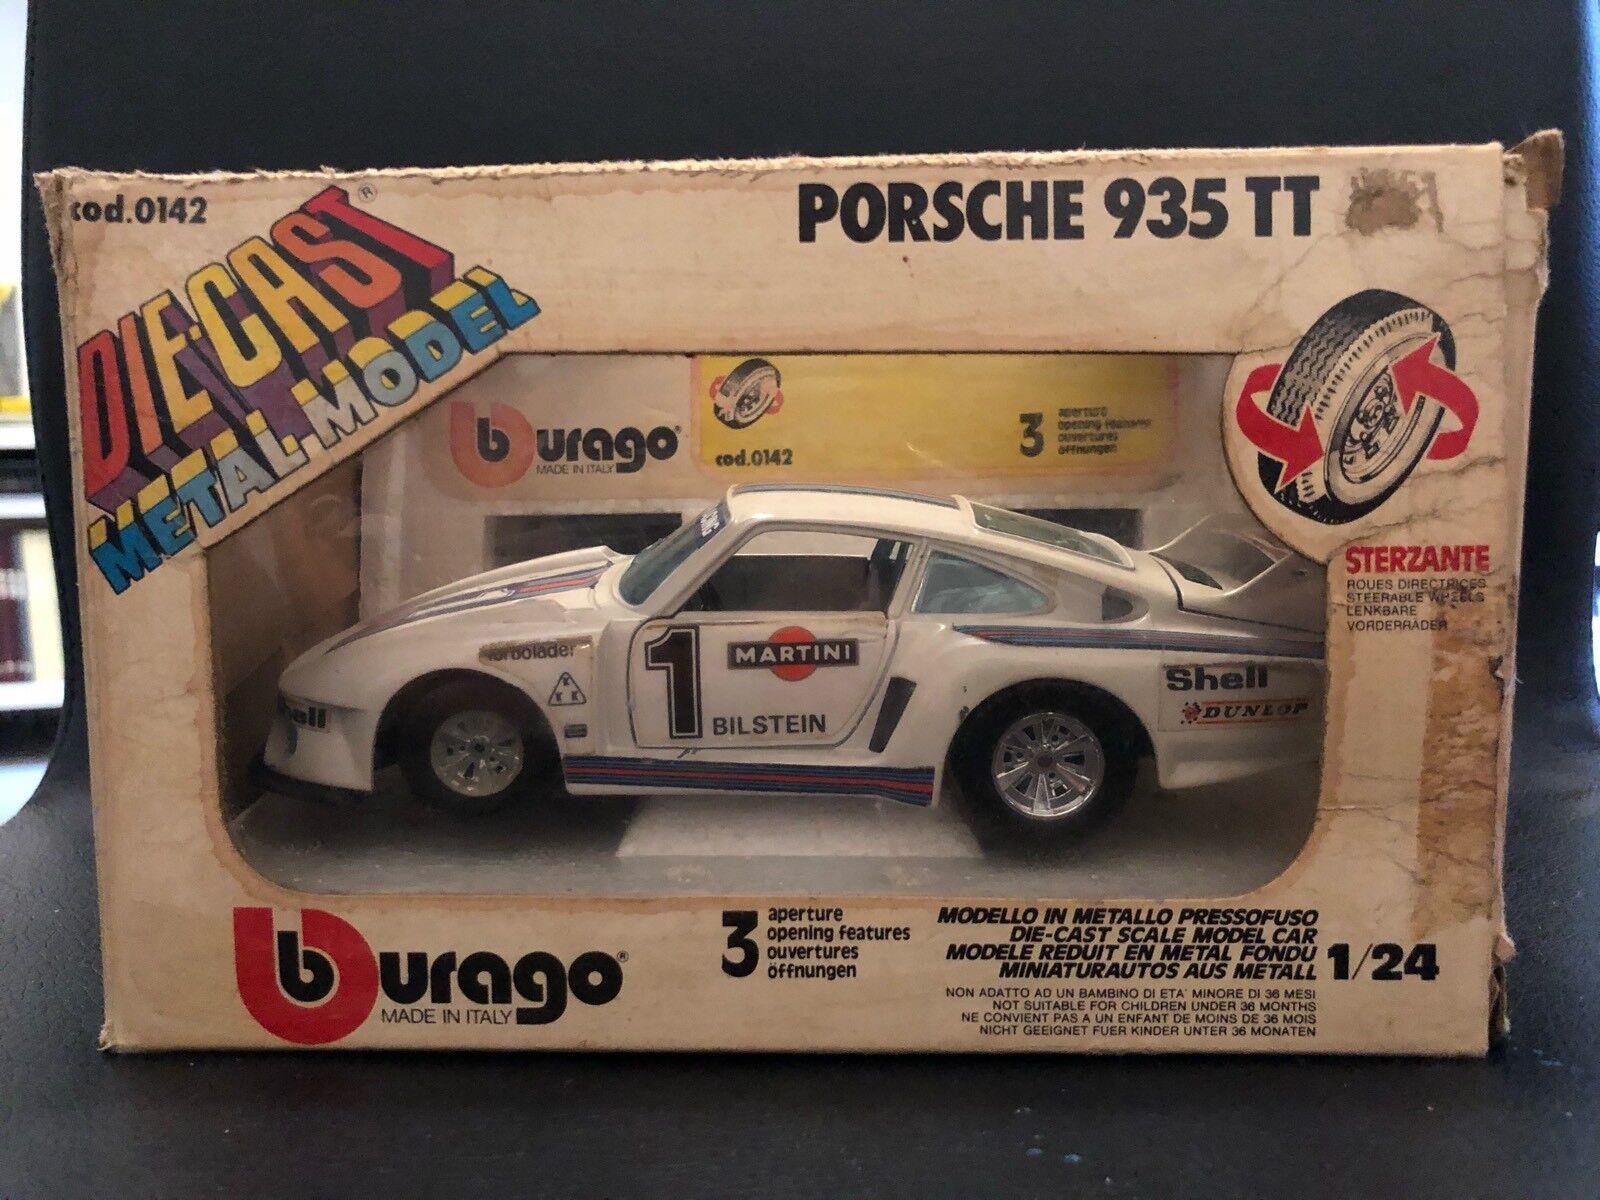 1 Model No 935 Die Martoys Tt Porsche Made Metal Burago Old B In 24 BQCeWrodx